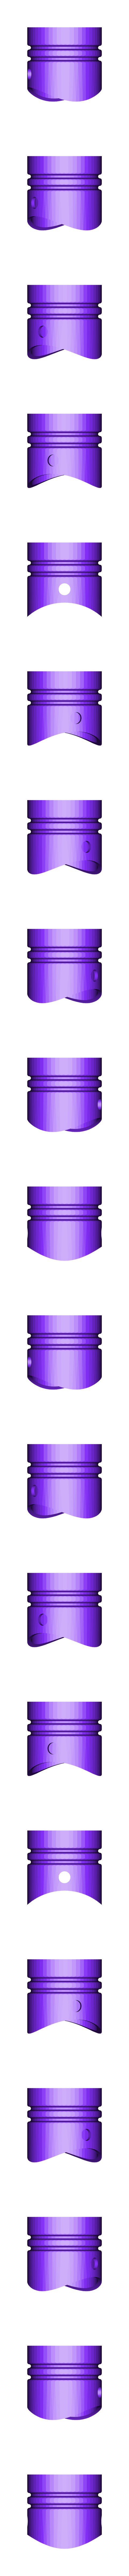 Piston.stl Download STL file PISTON • 3D printing object, Projectdis